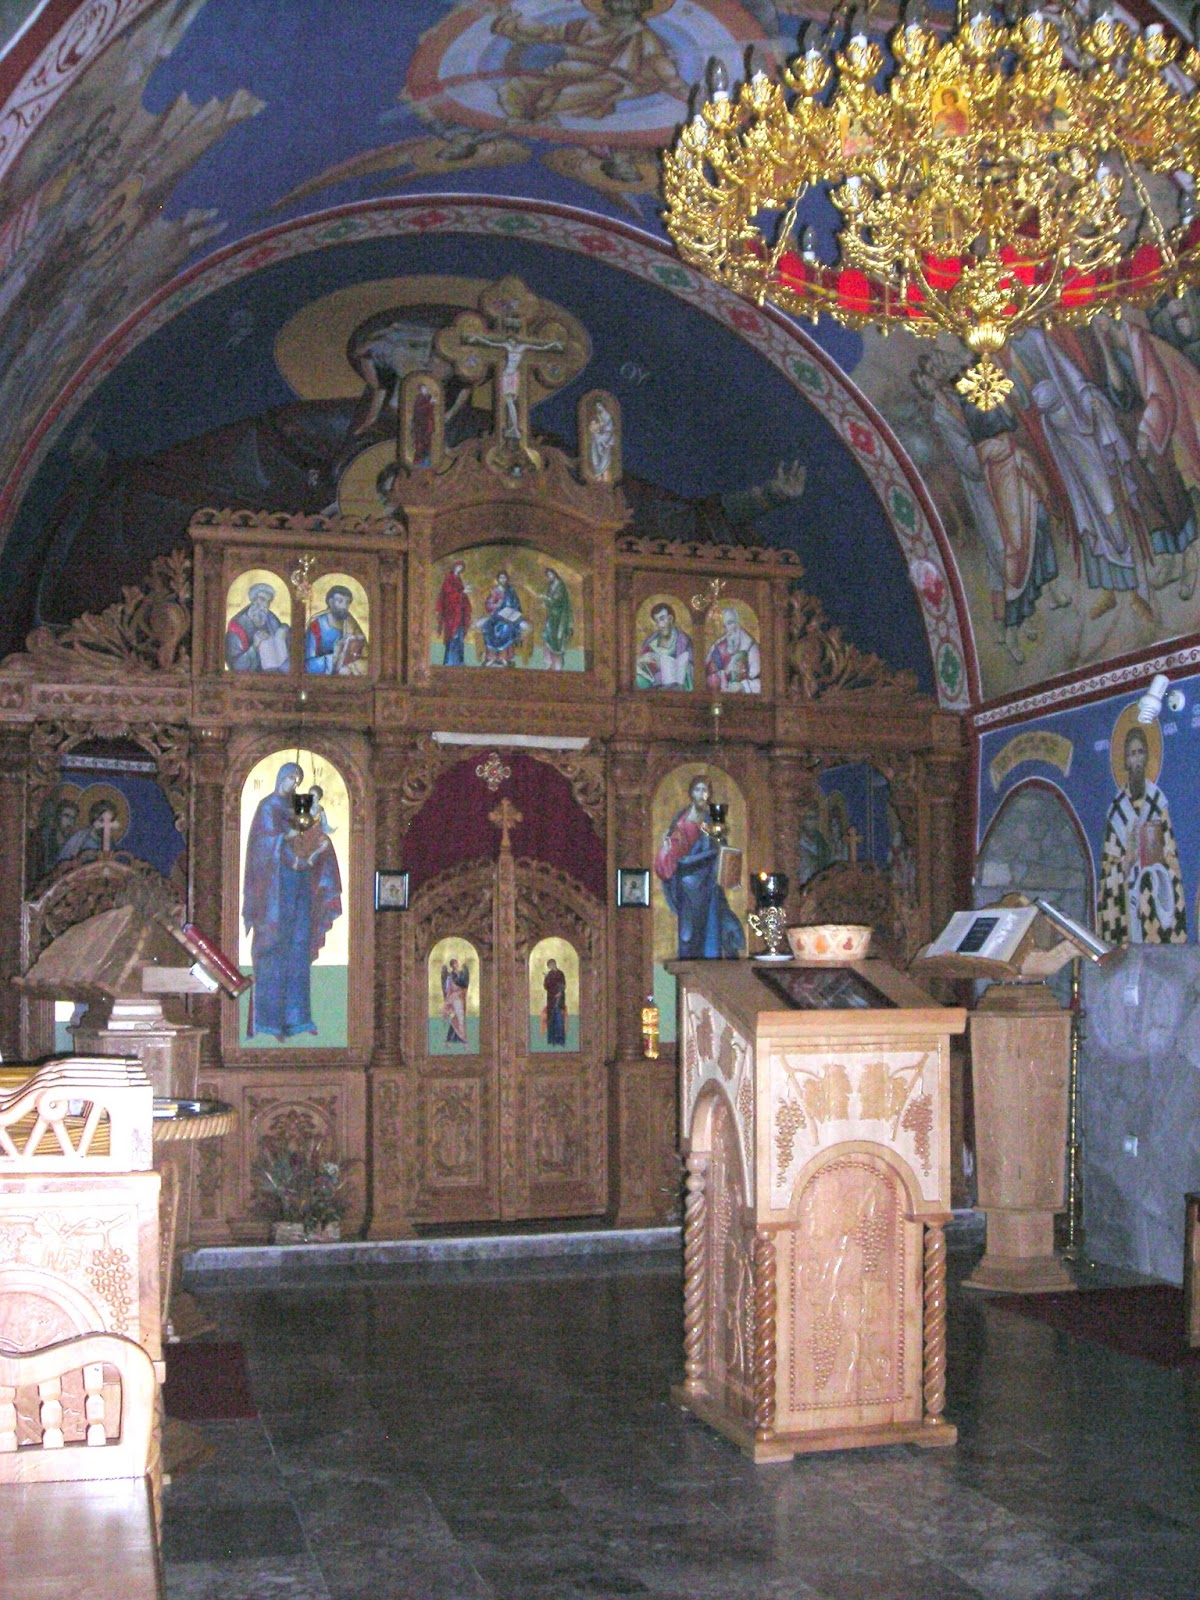 unutrasnjost-manastira-u-plesu.jpg